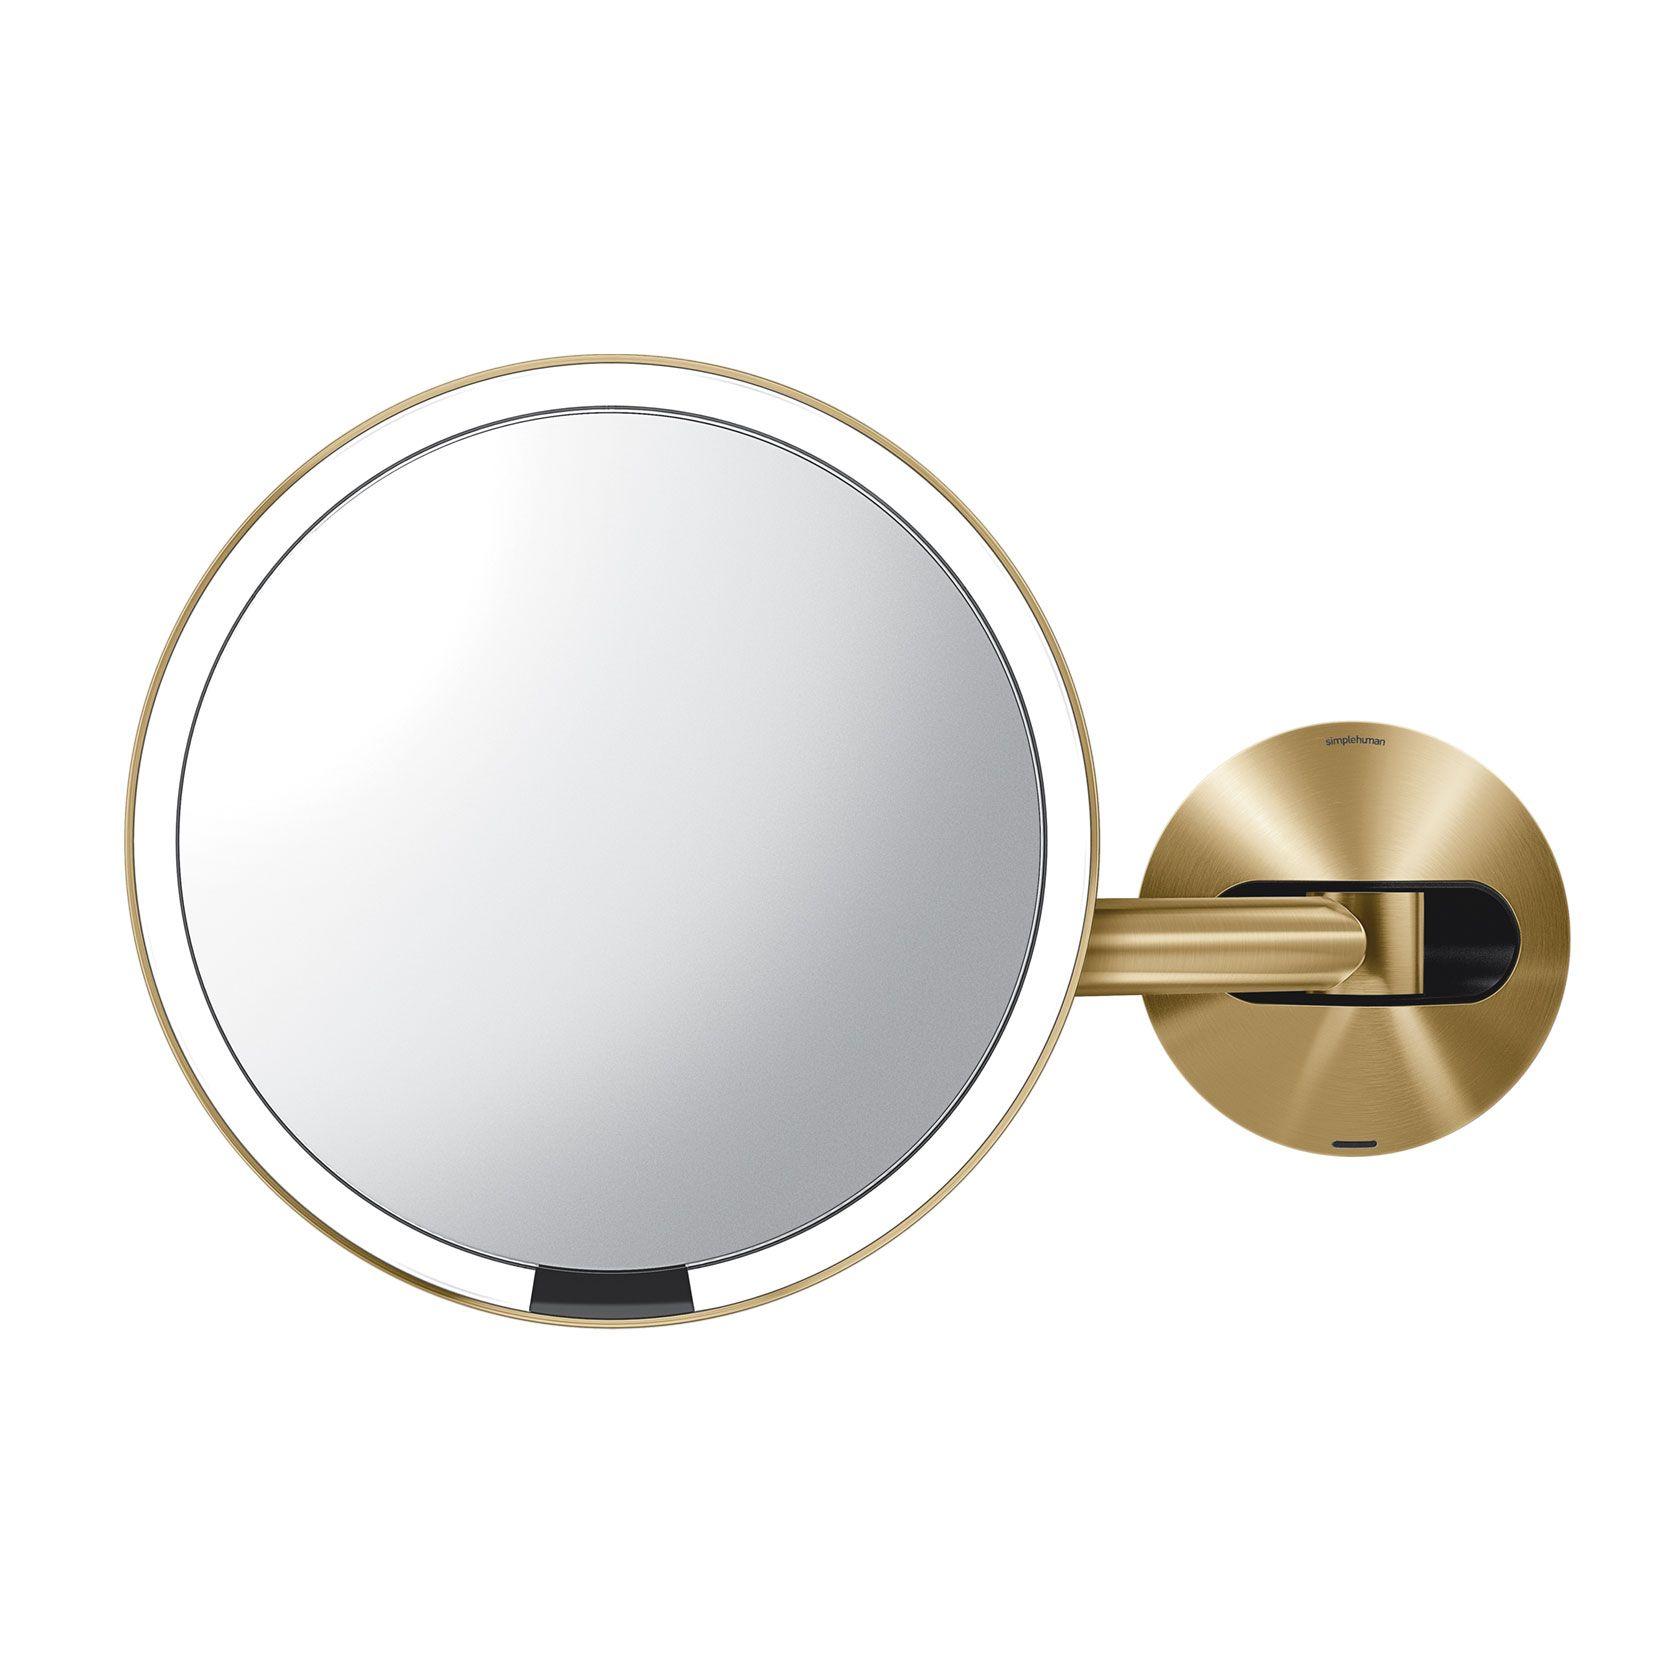 Simplehuman 8 Inch Wall Mounted Sensor Mirror Lighted Makeup